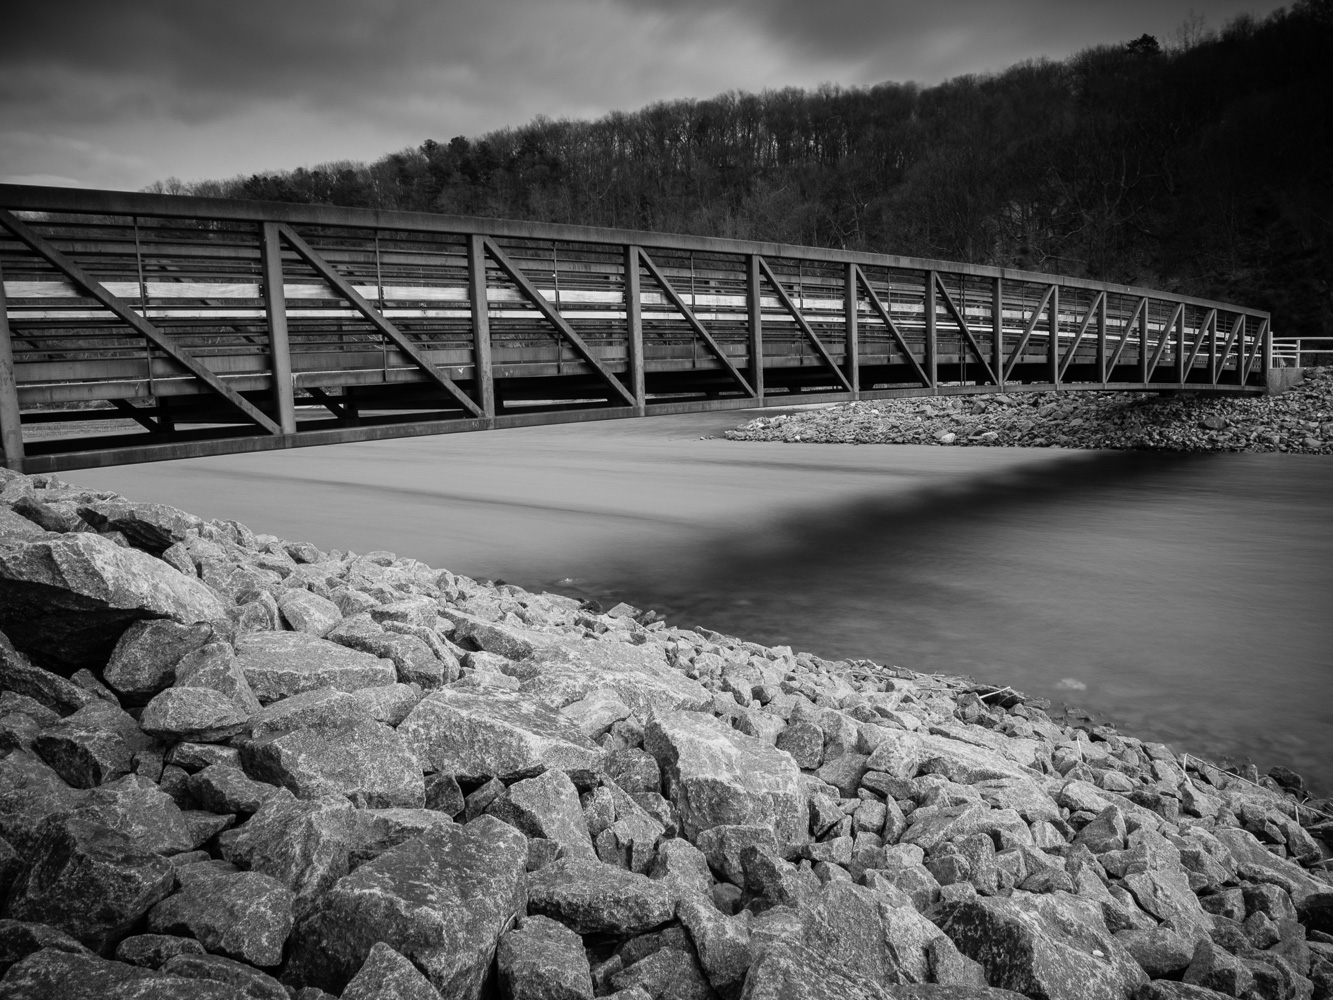 sunken_meadow_bridge_april_2015